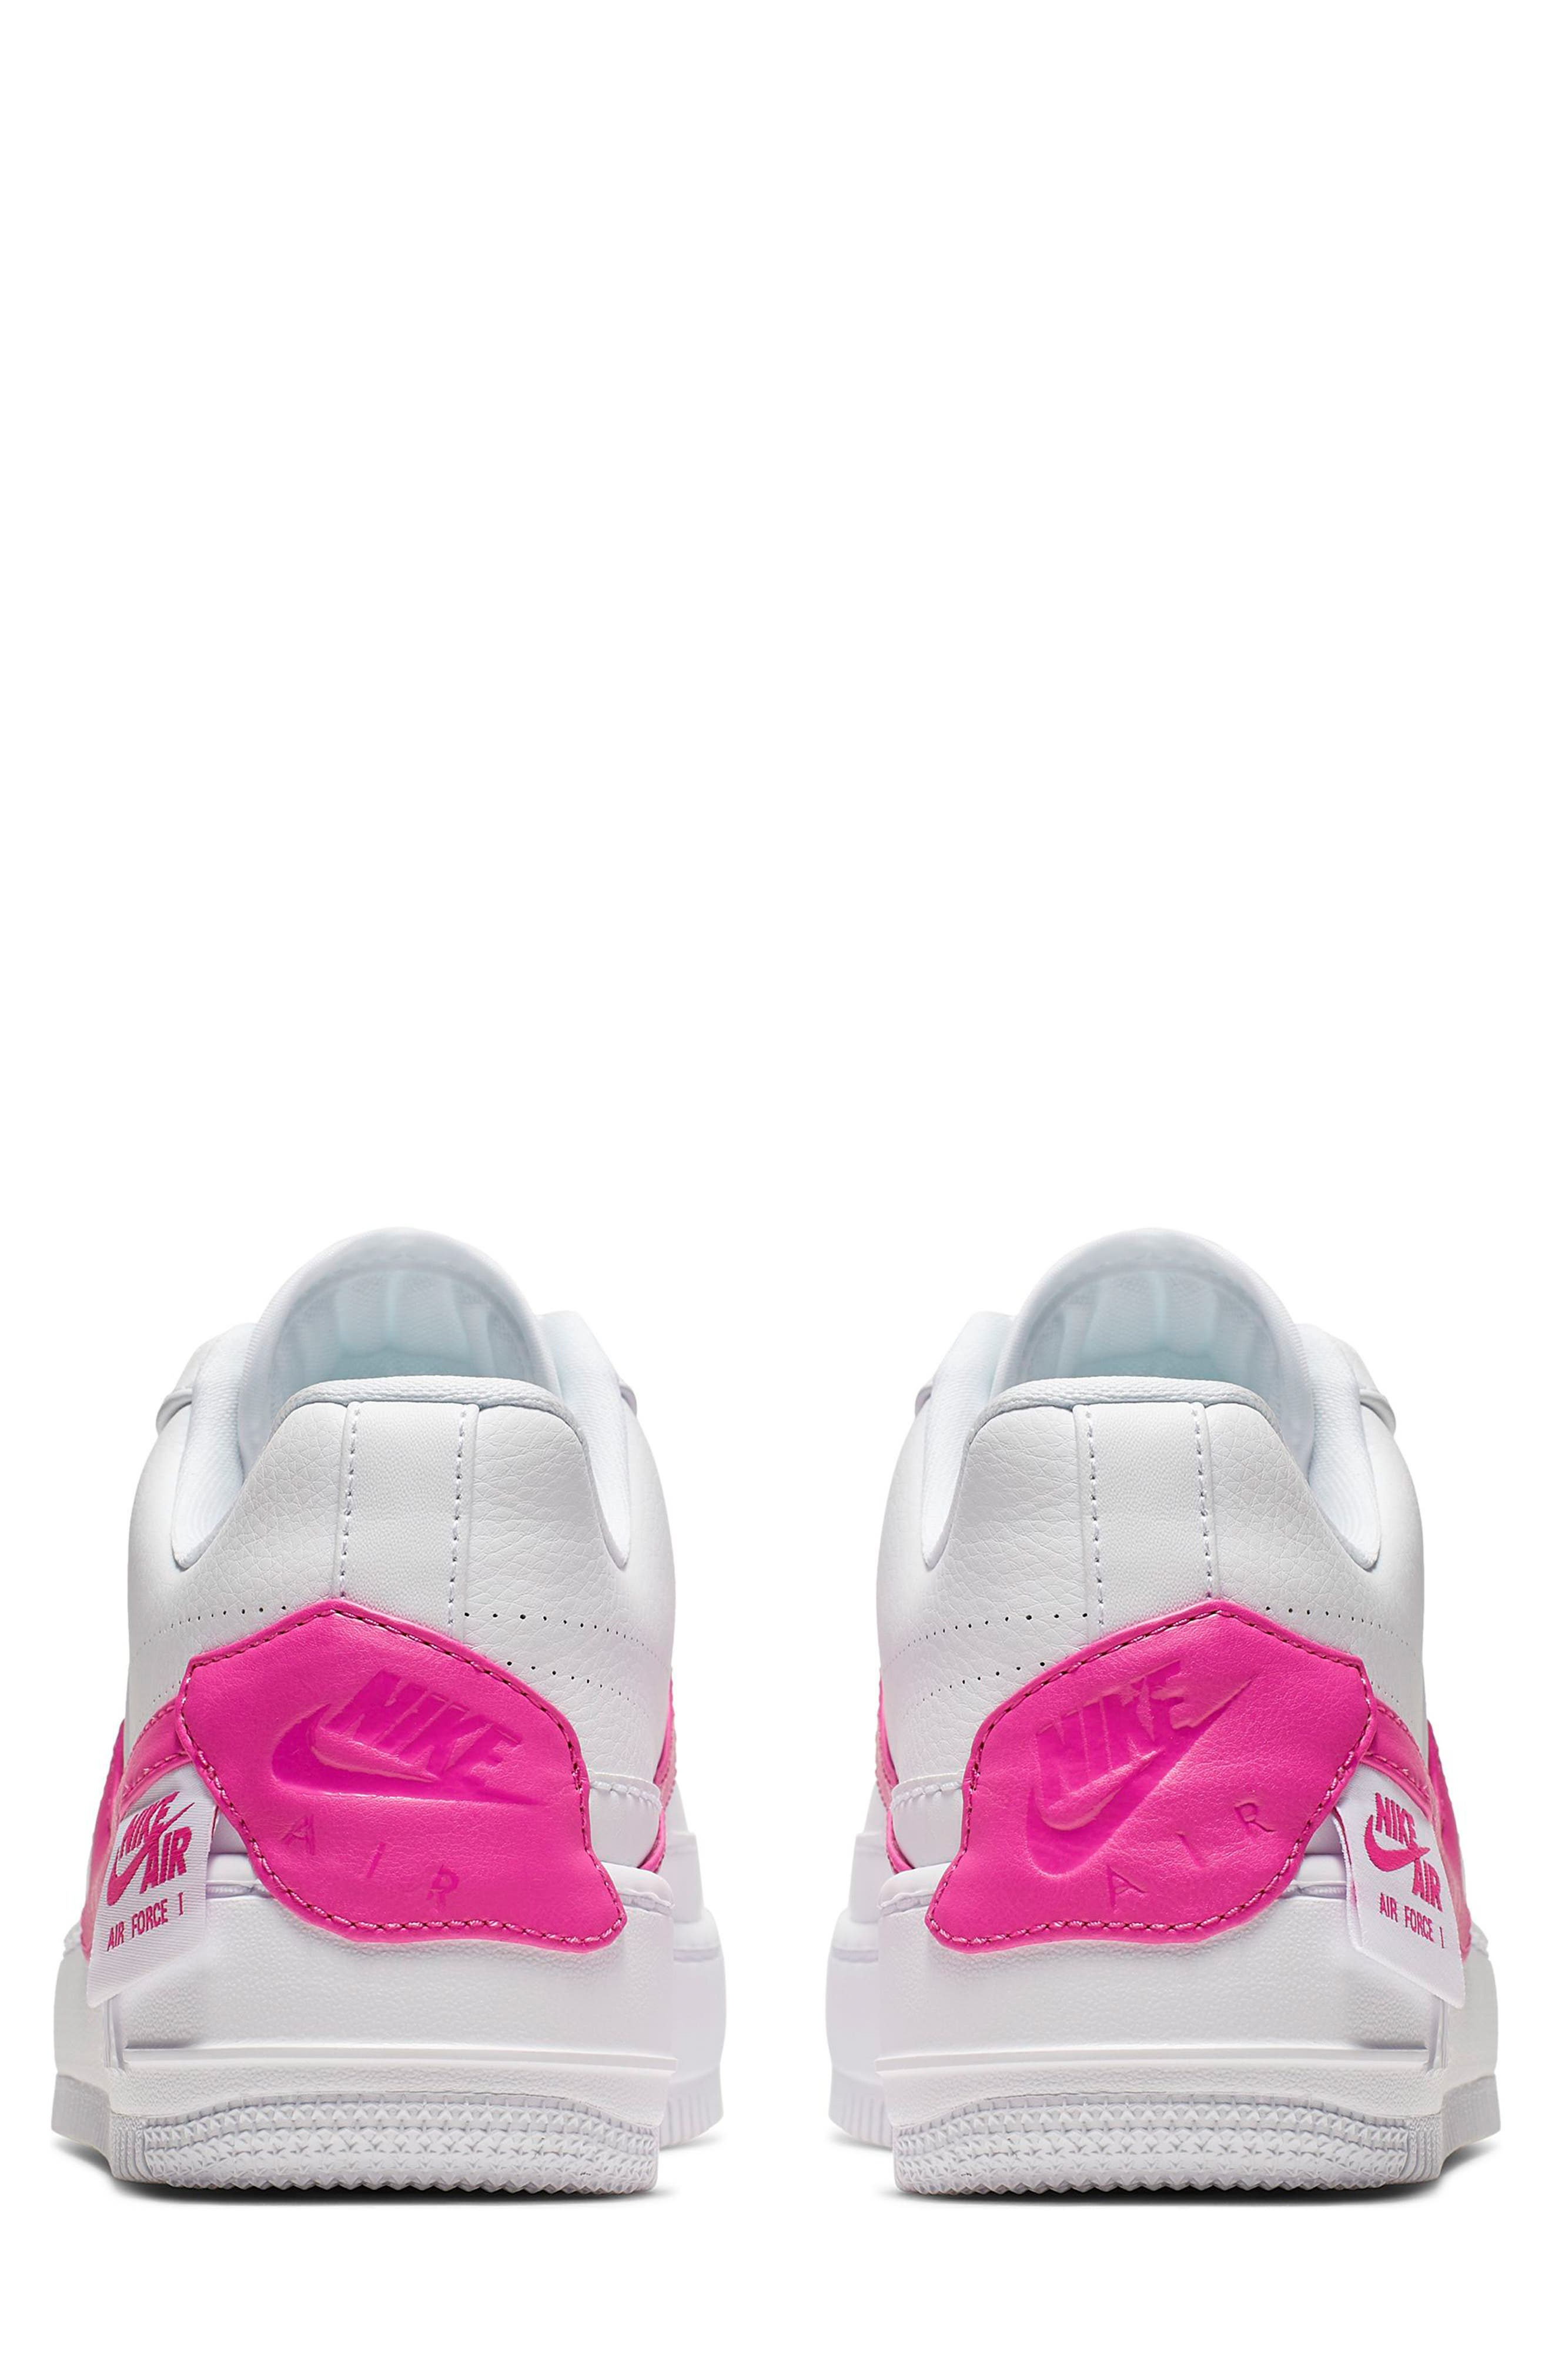 NIKE, Air Force 1 Jester XX Sneaker, Alternate thumbnail 2, color, WHITE/ LASER FUCHSIA